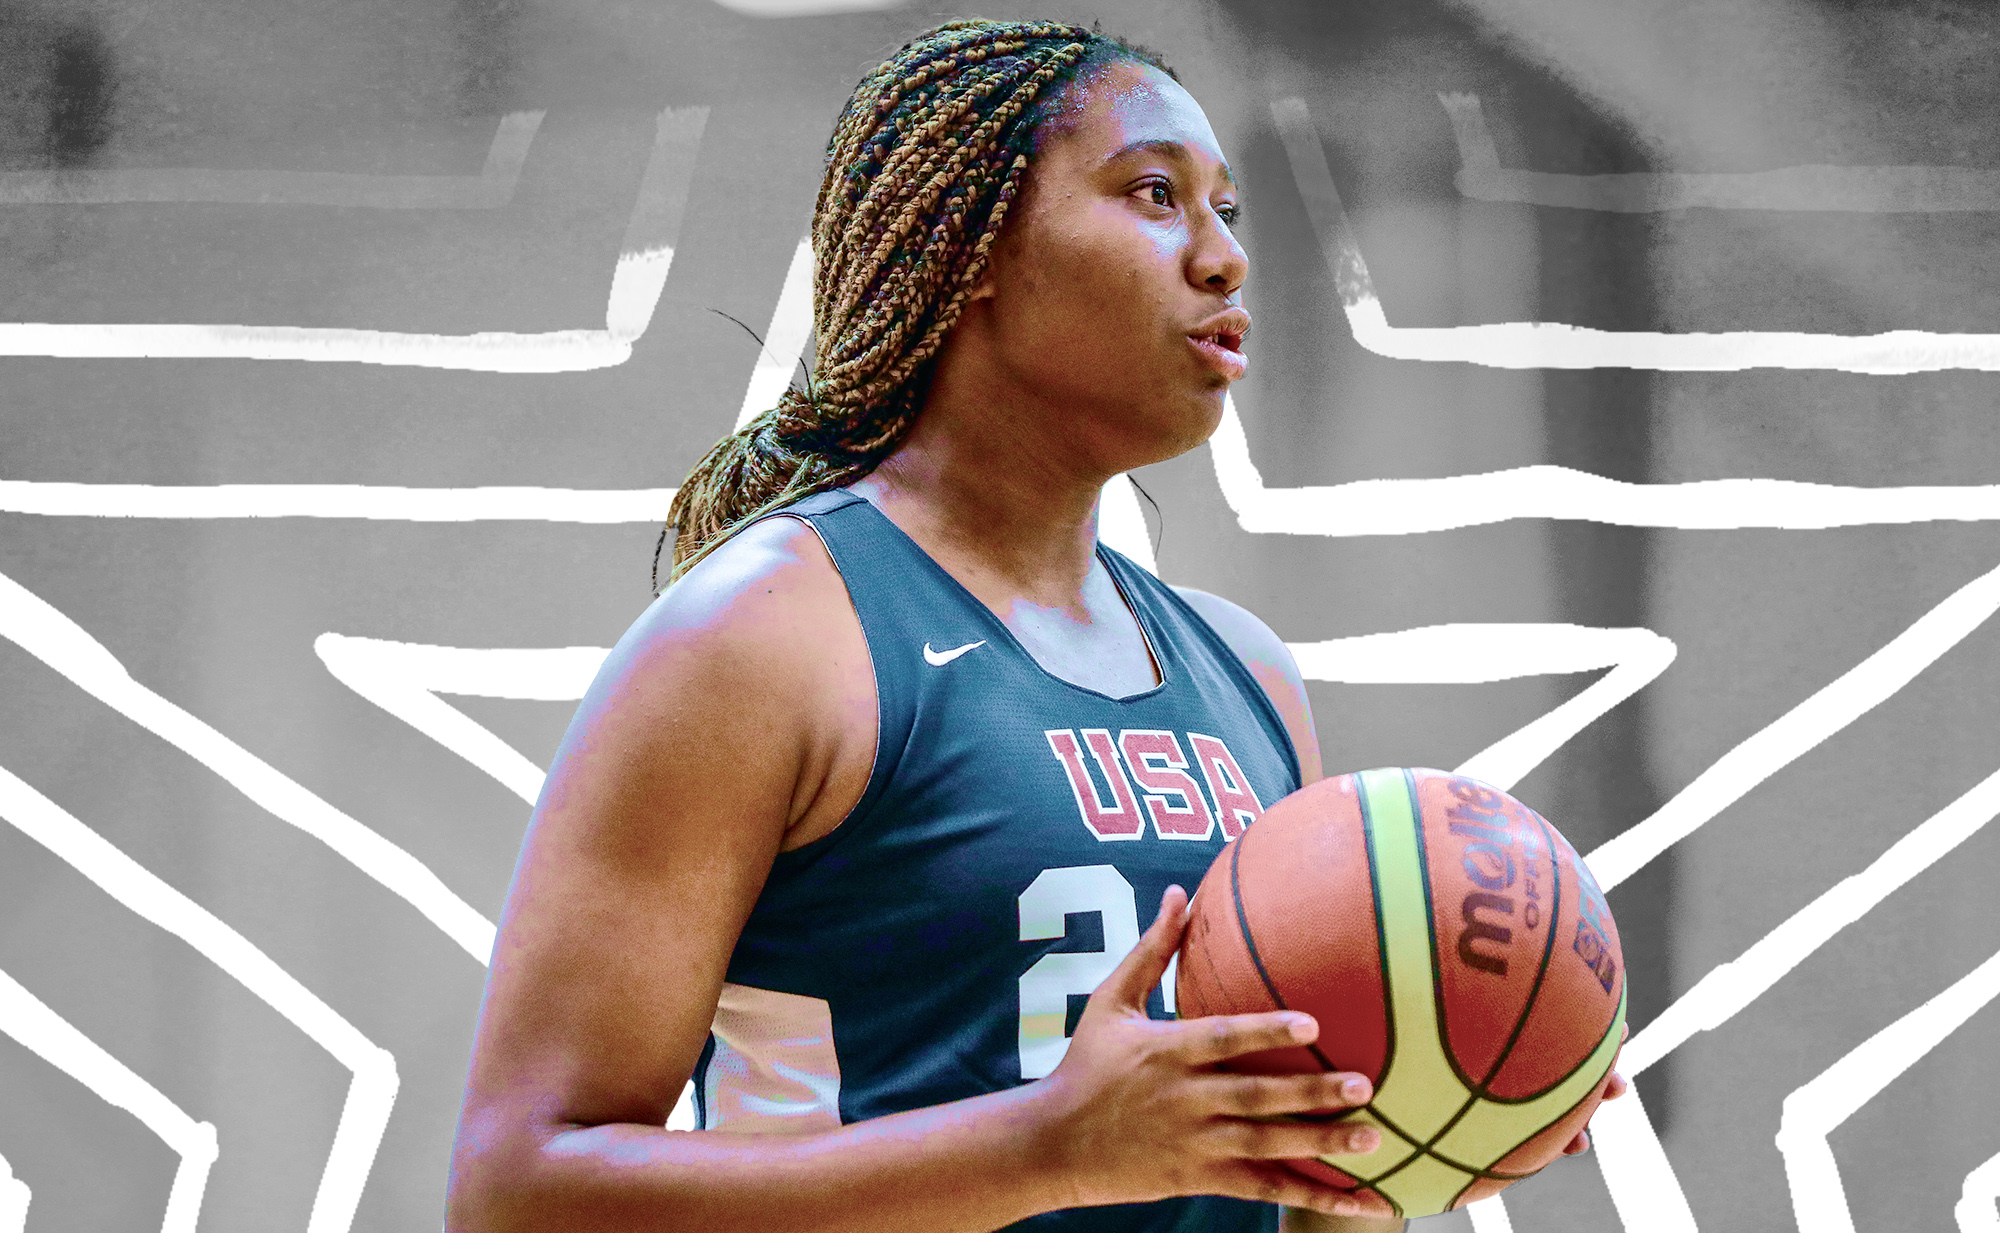 South Carolina women's basketball player Aliyah Boston played for Team USA Under-19.